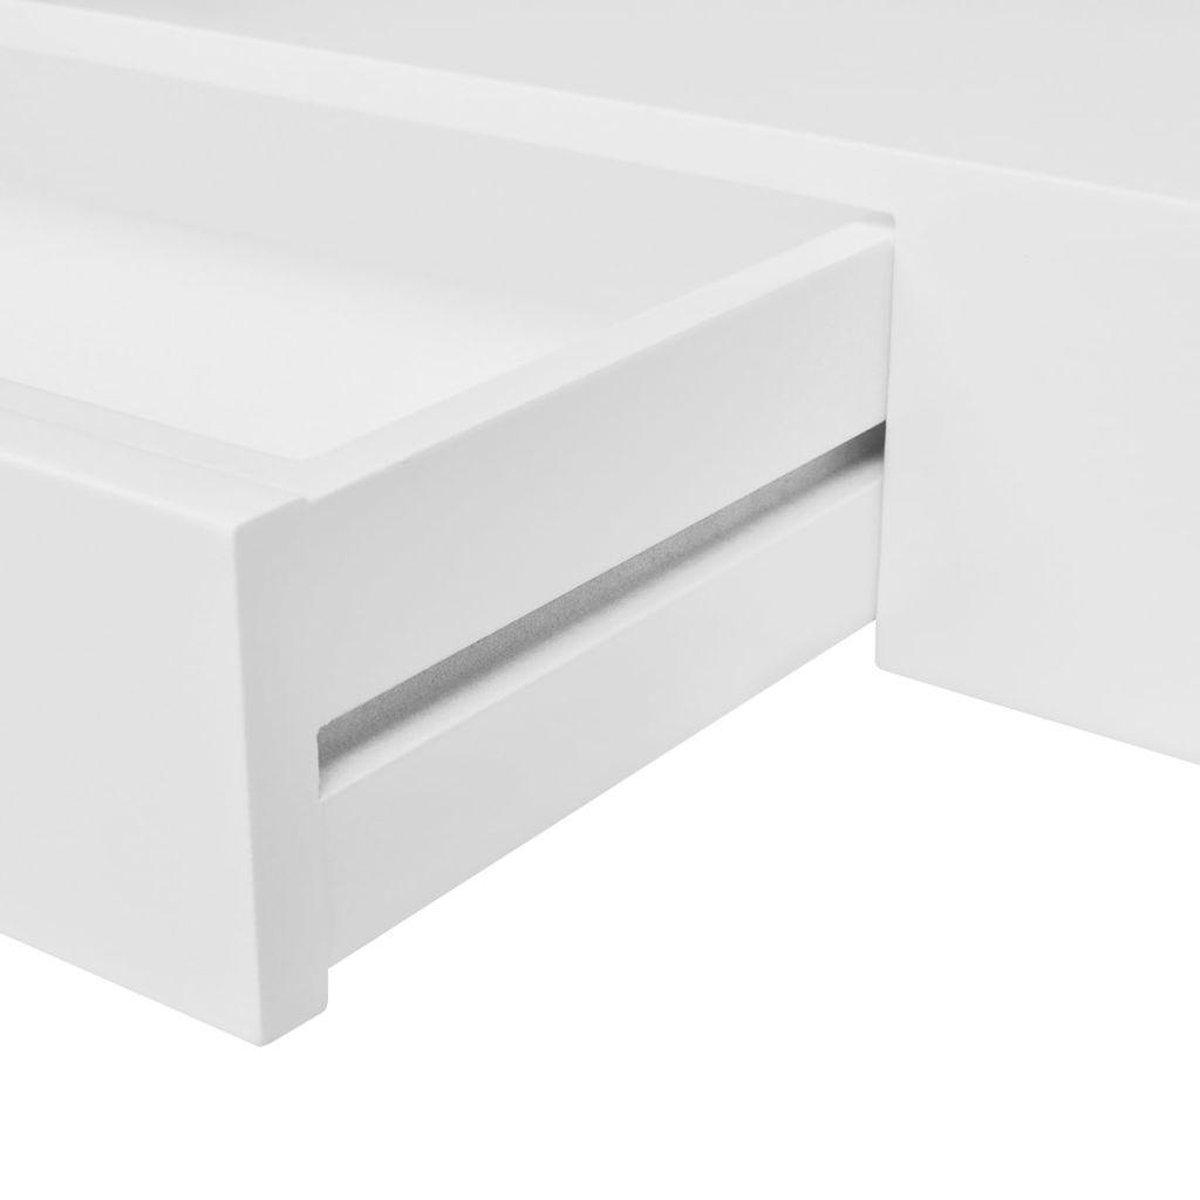 VidaXL Wandplank - 48x25 Cm - Wit - vidaXL